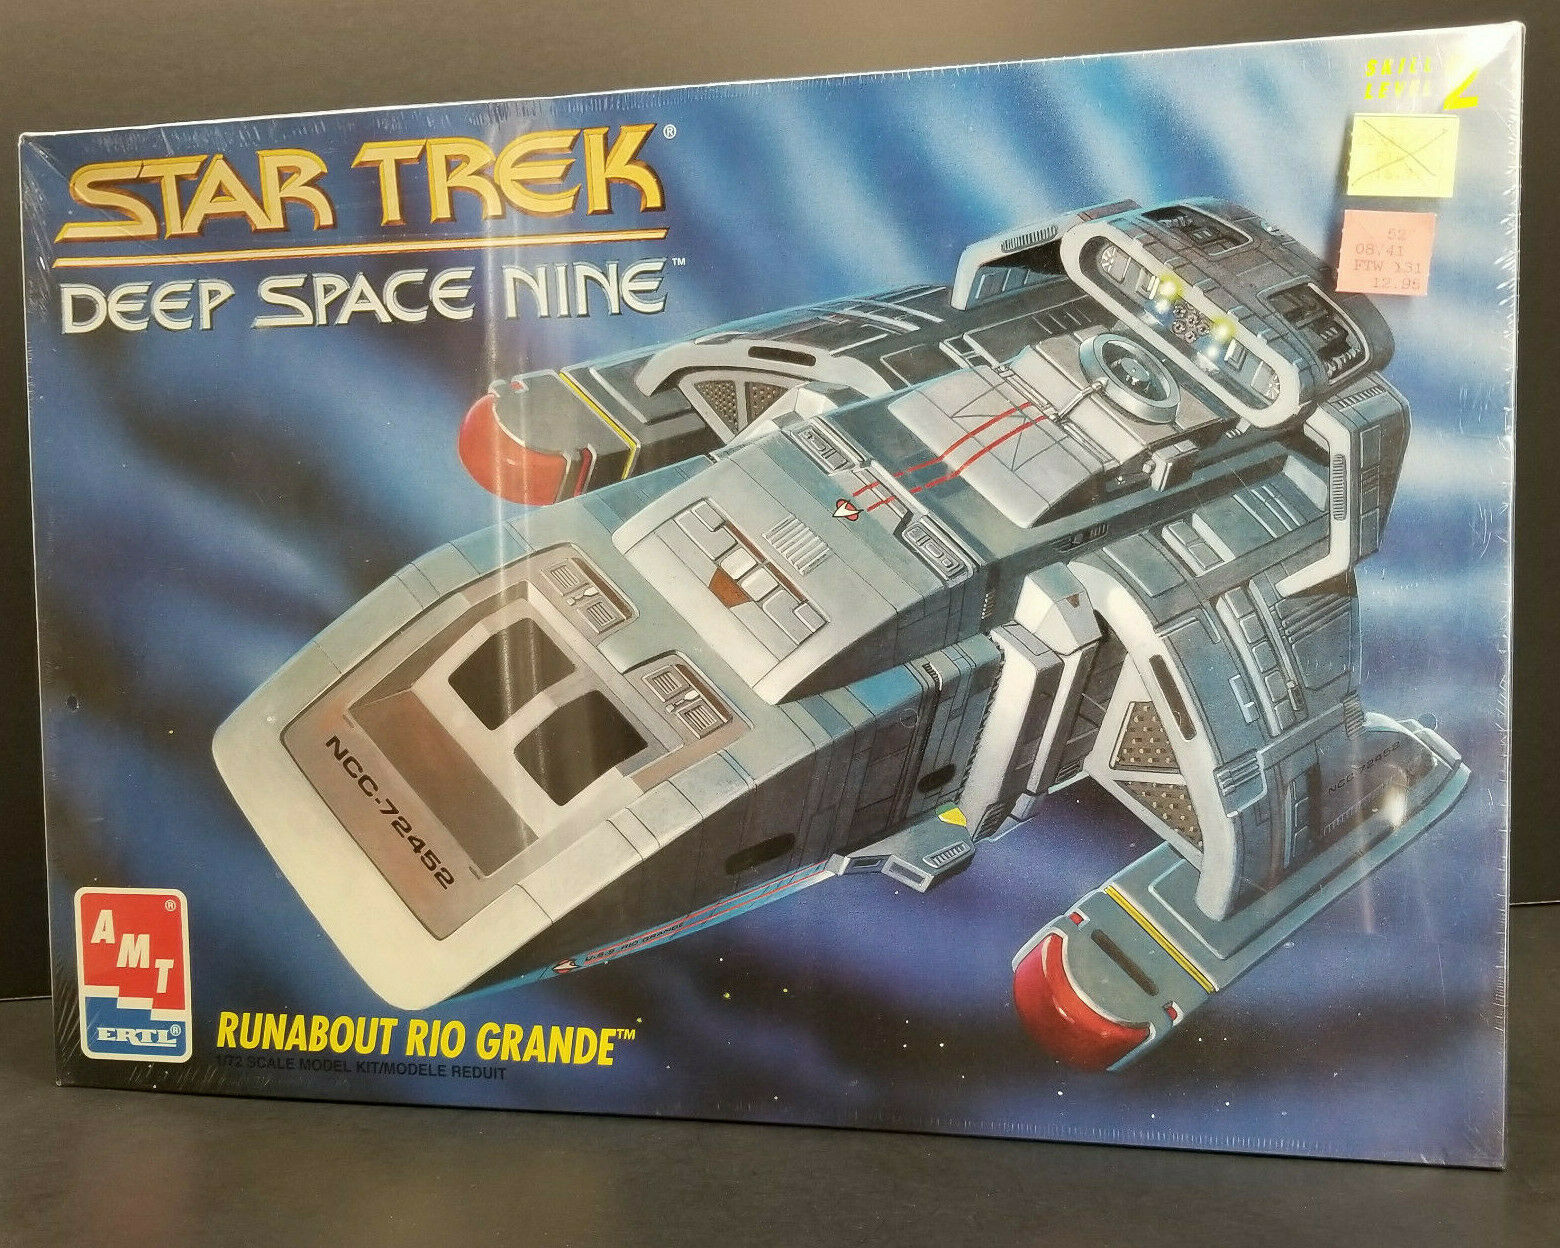 Runabout Rio Grande Star Trek Deep Space Nine AMT Model Kit 1993 Mint in Sealed